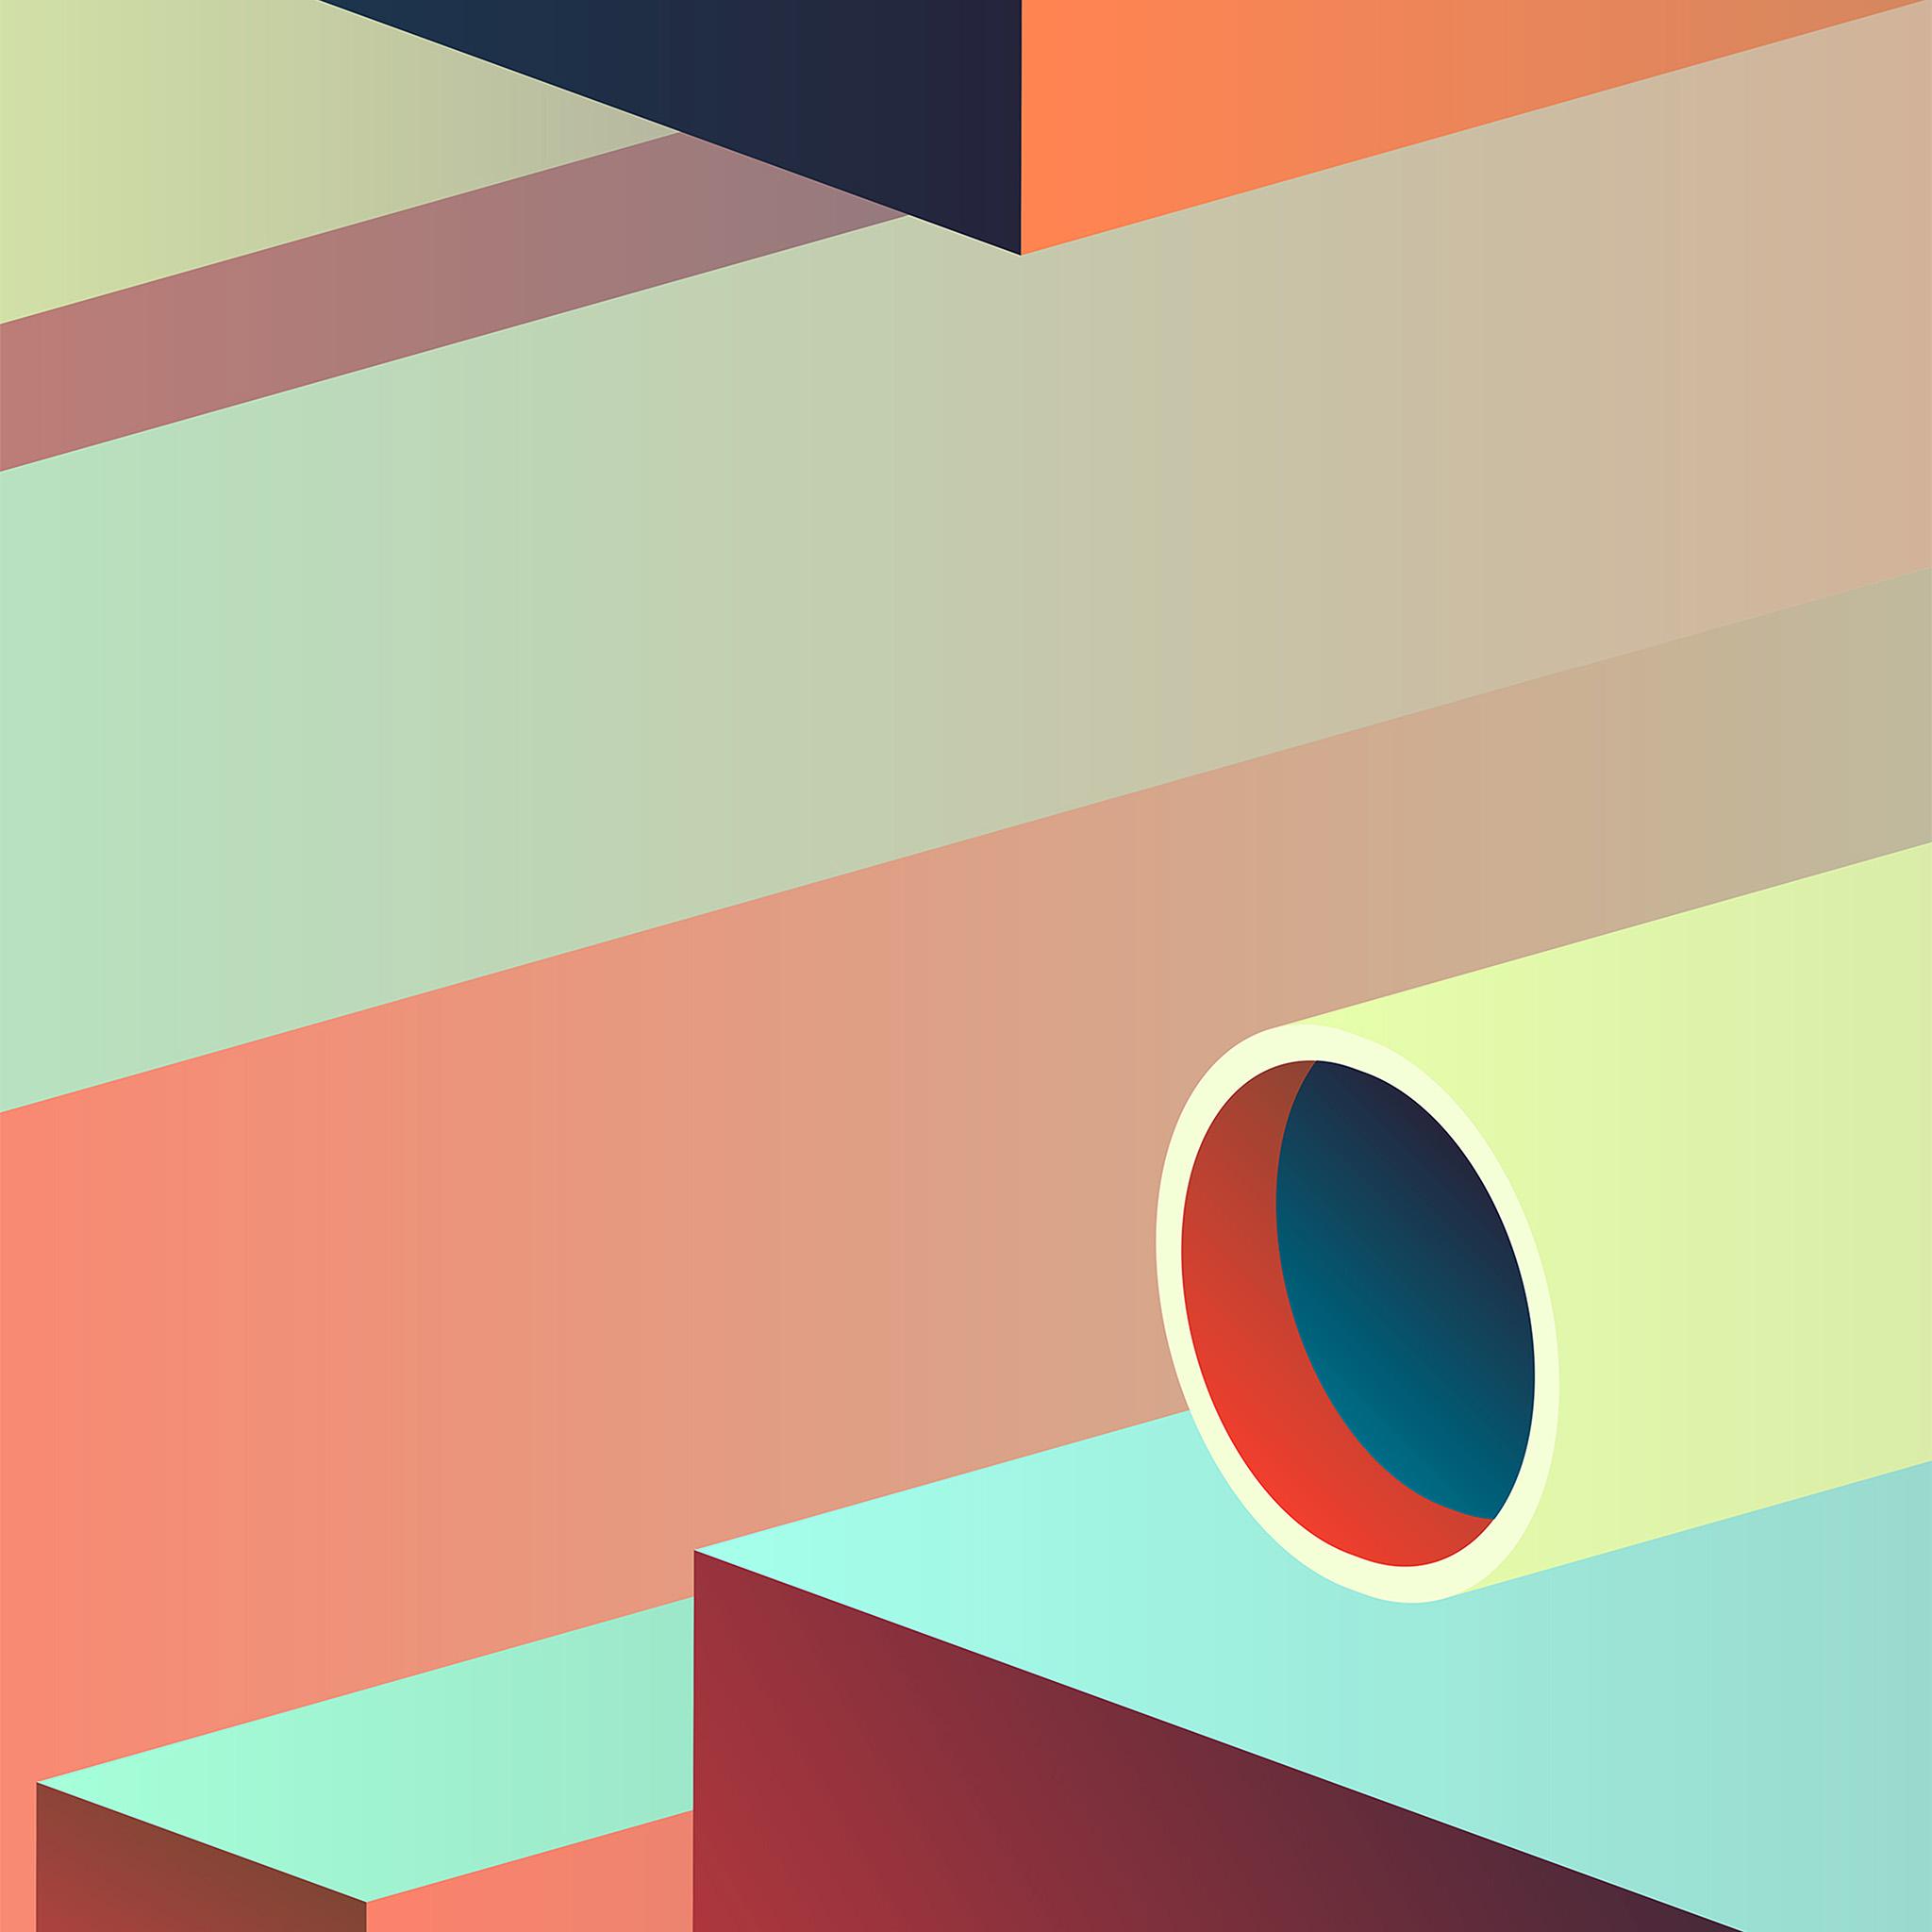 vz27-color-flat-digital-abstract-pattern-background-wallpaper